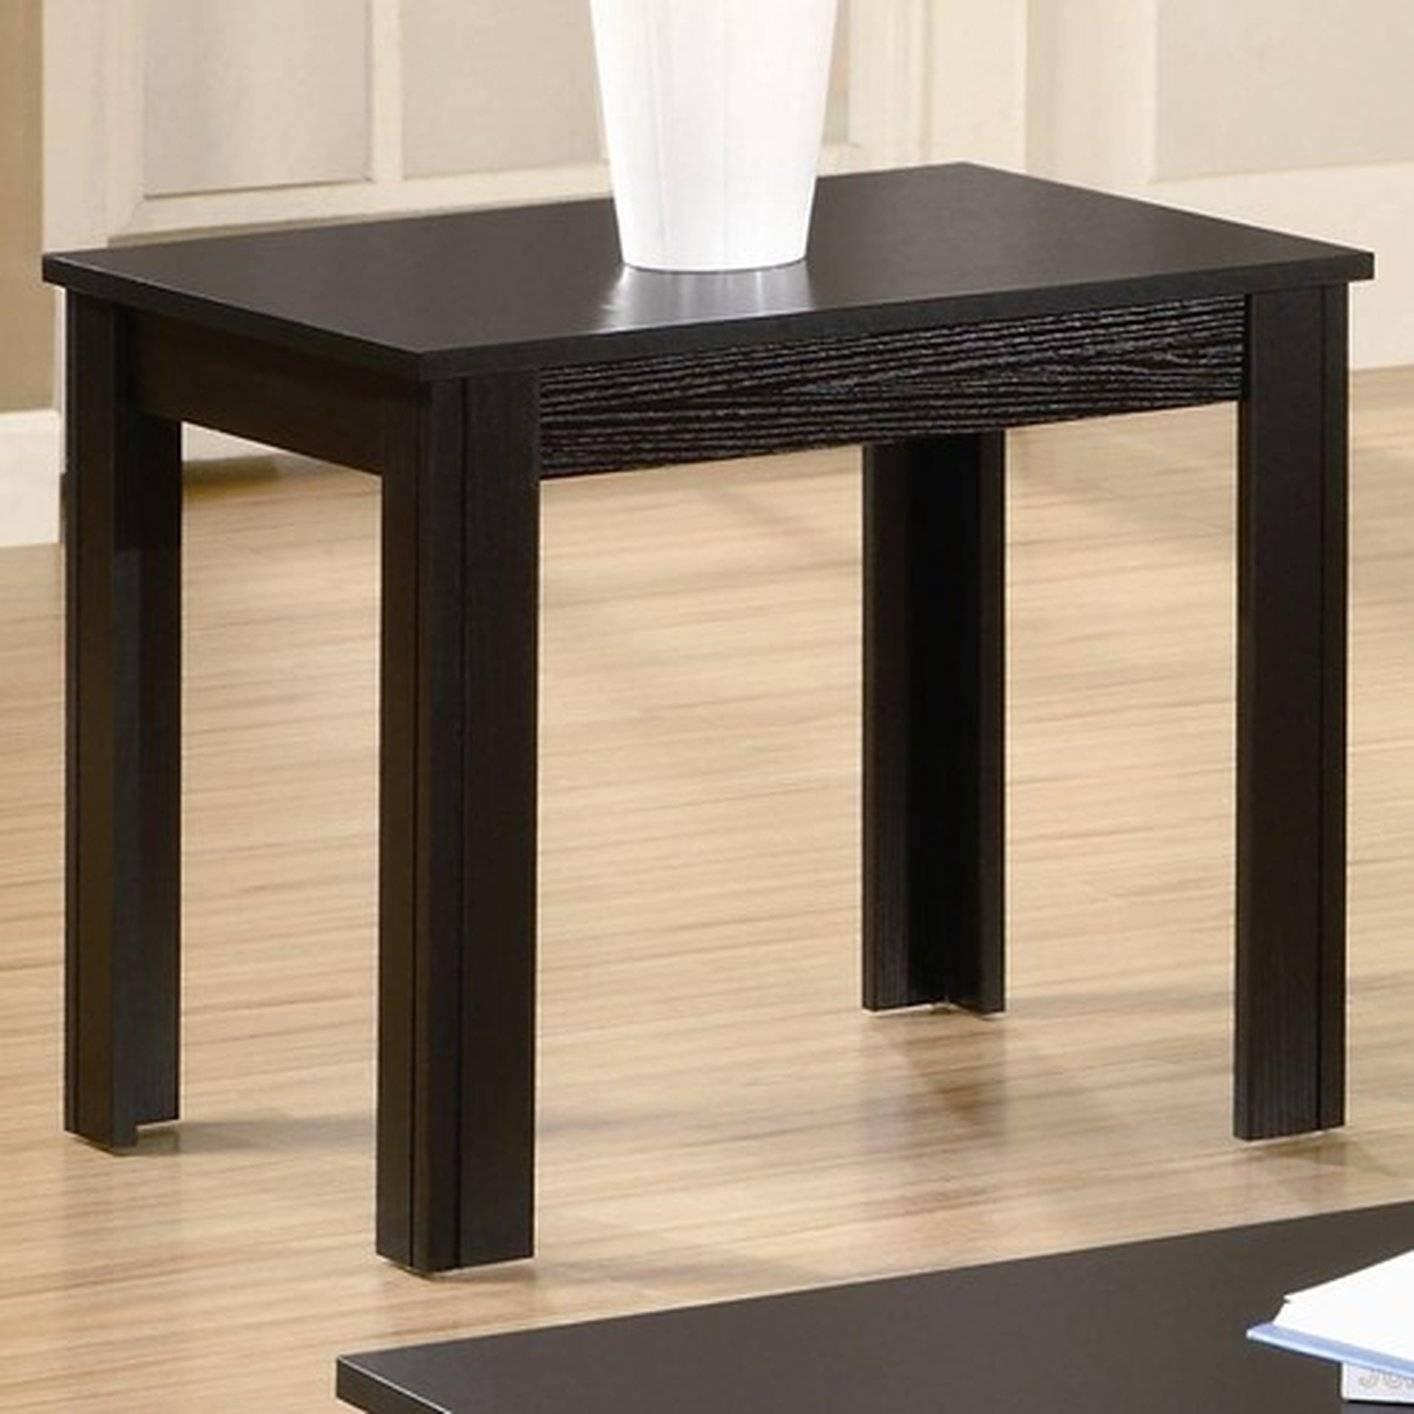 Coaster Bachman 700225 Black Wood Coffee Table Set - Steal-A-Sofa for Black Wood Coffee Tables (Image 10 of 30)